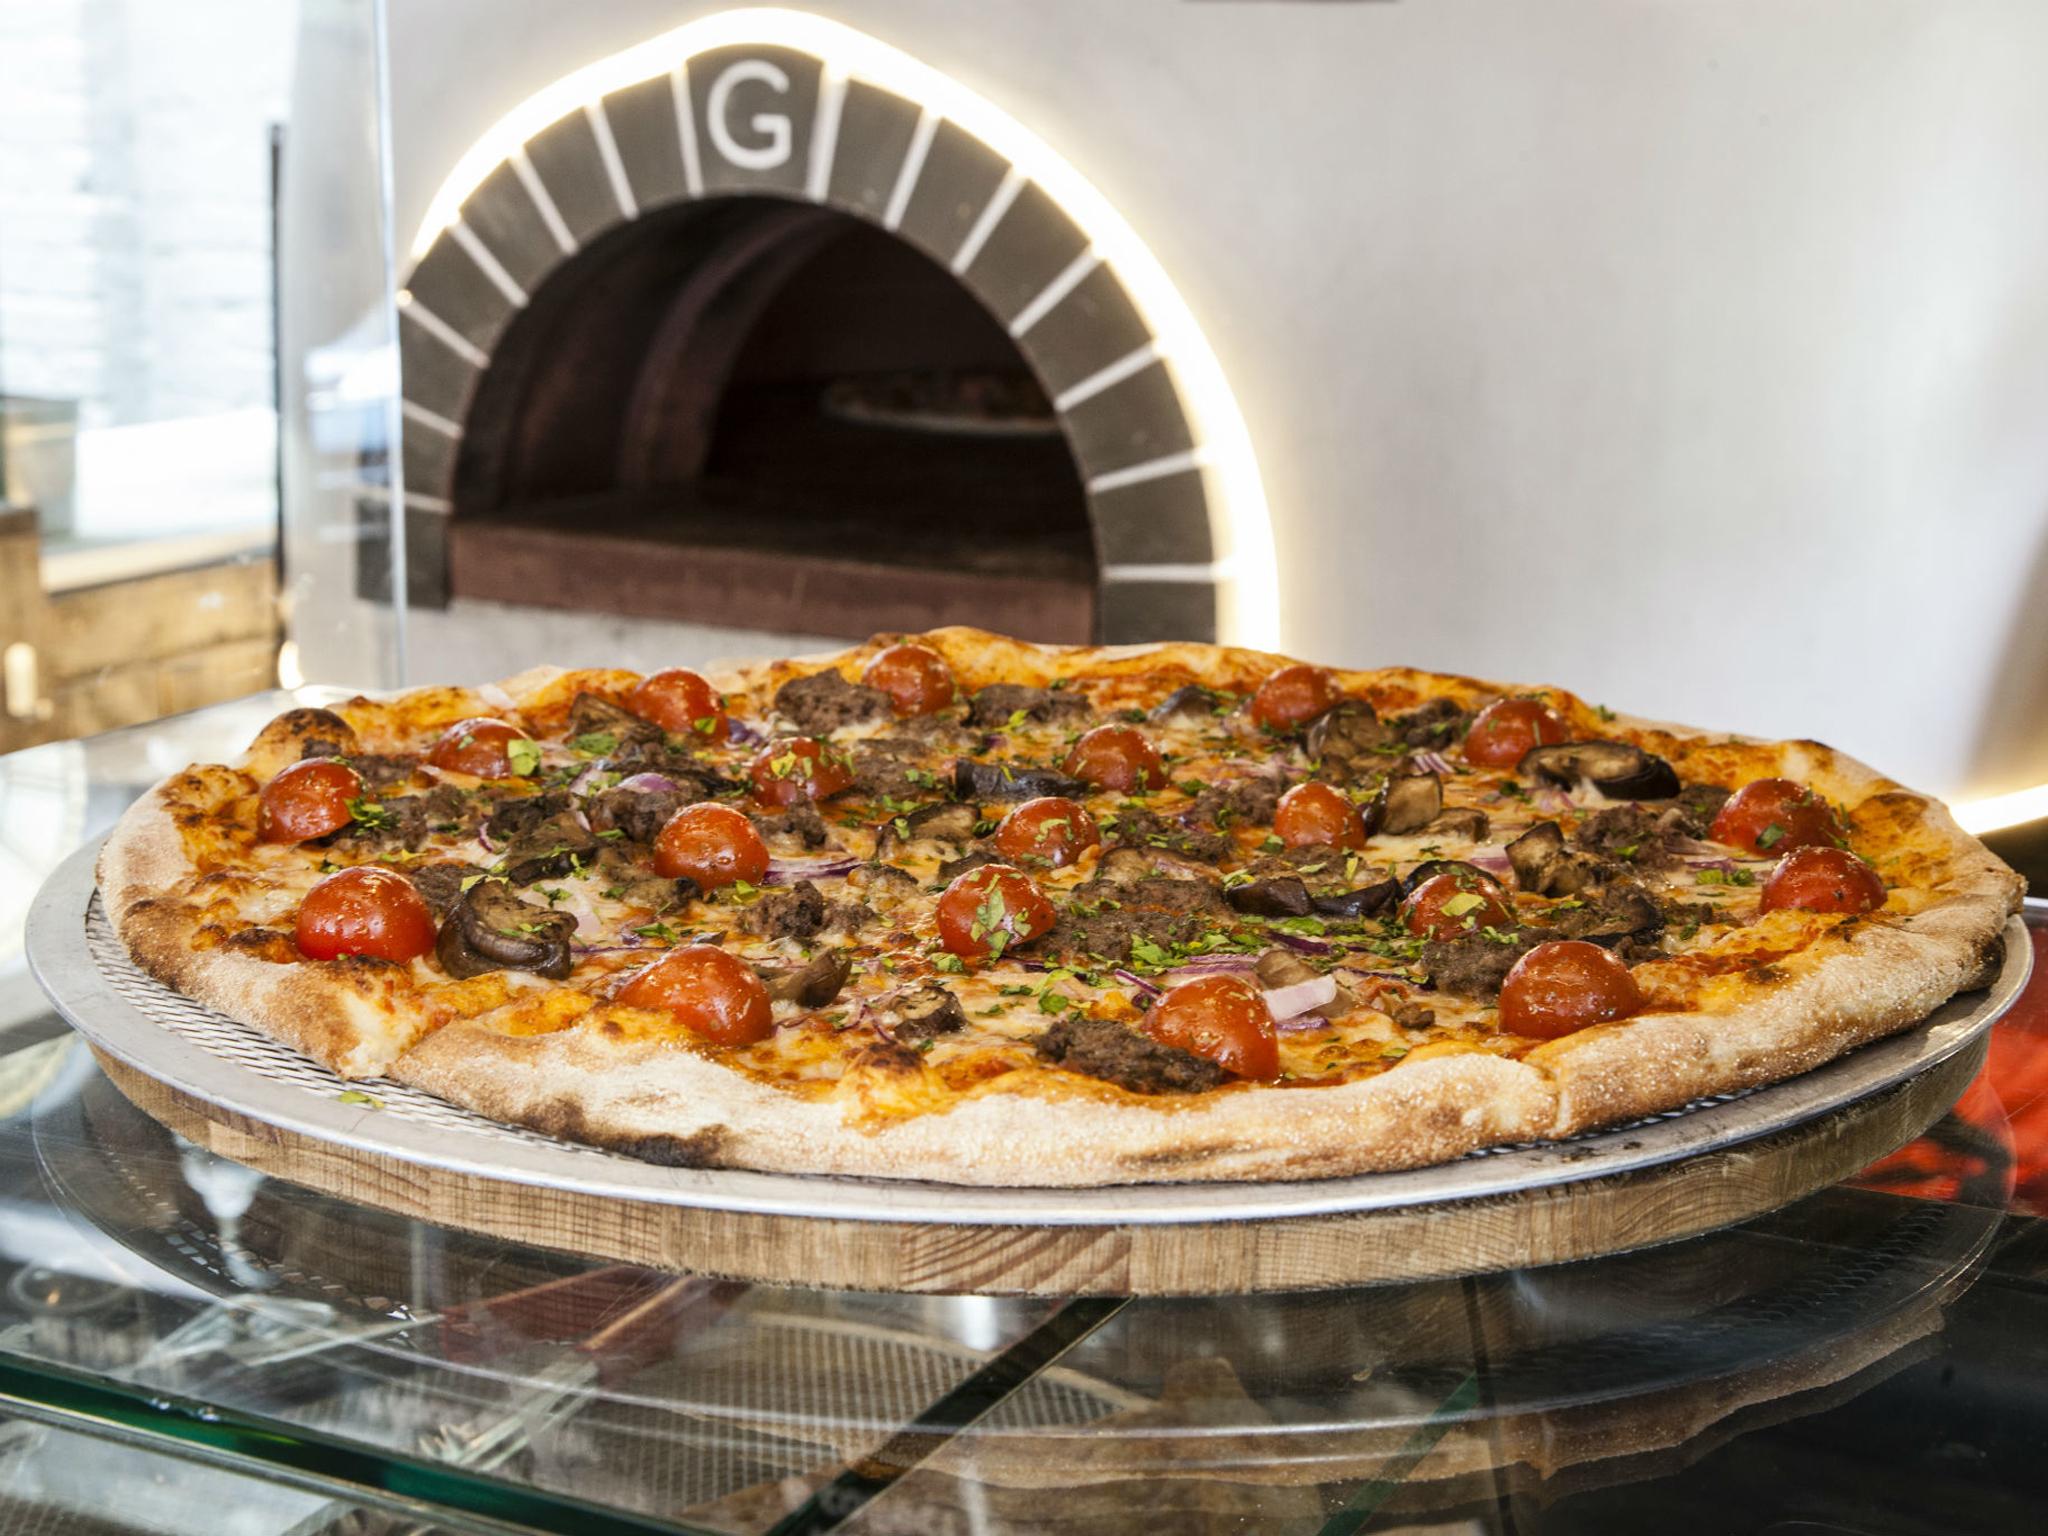 london's best pizza, pizza street